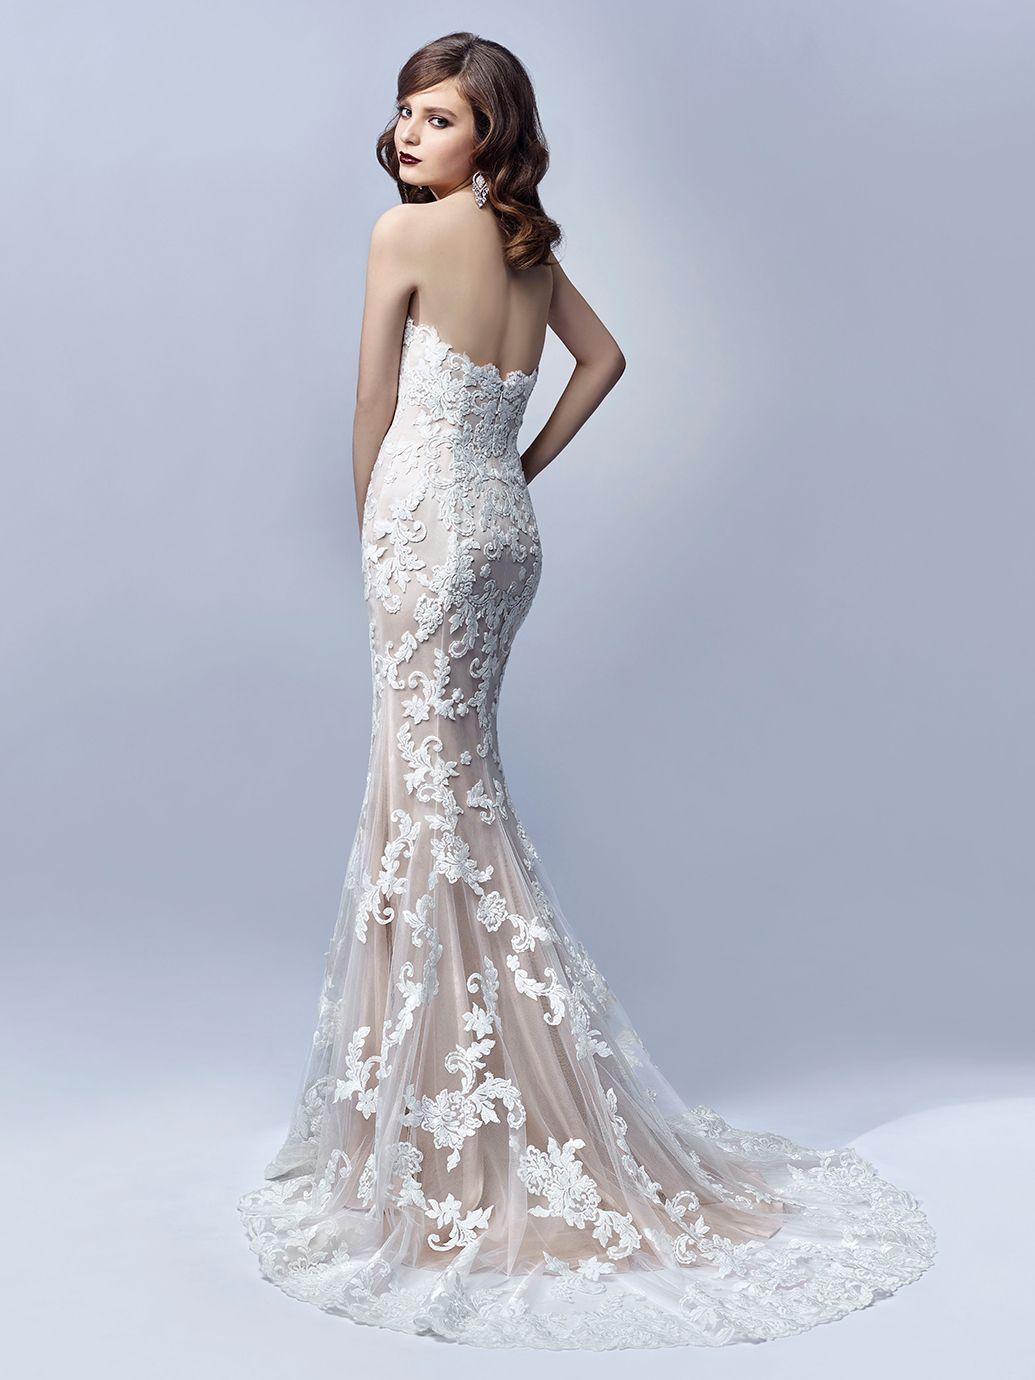 Bt enzoani obistar wedding ideas pinterest mermaid